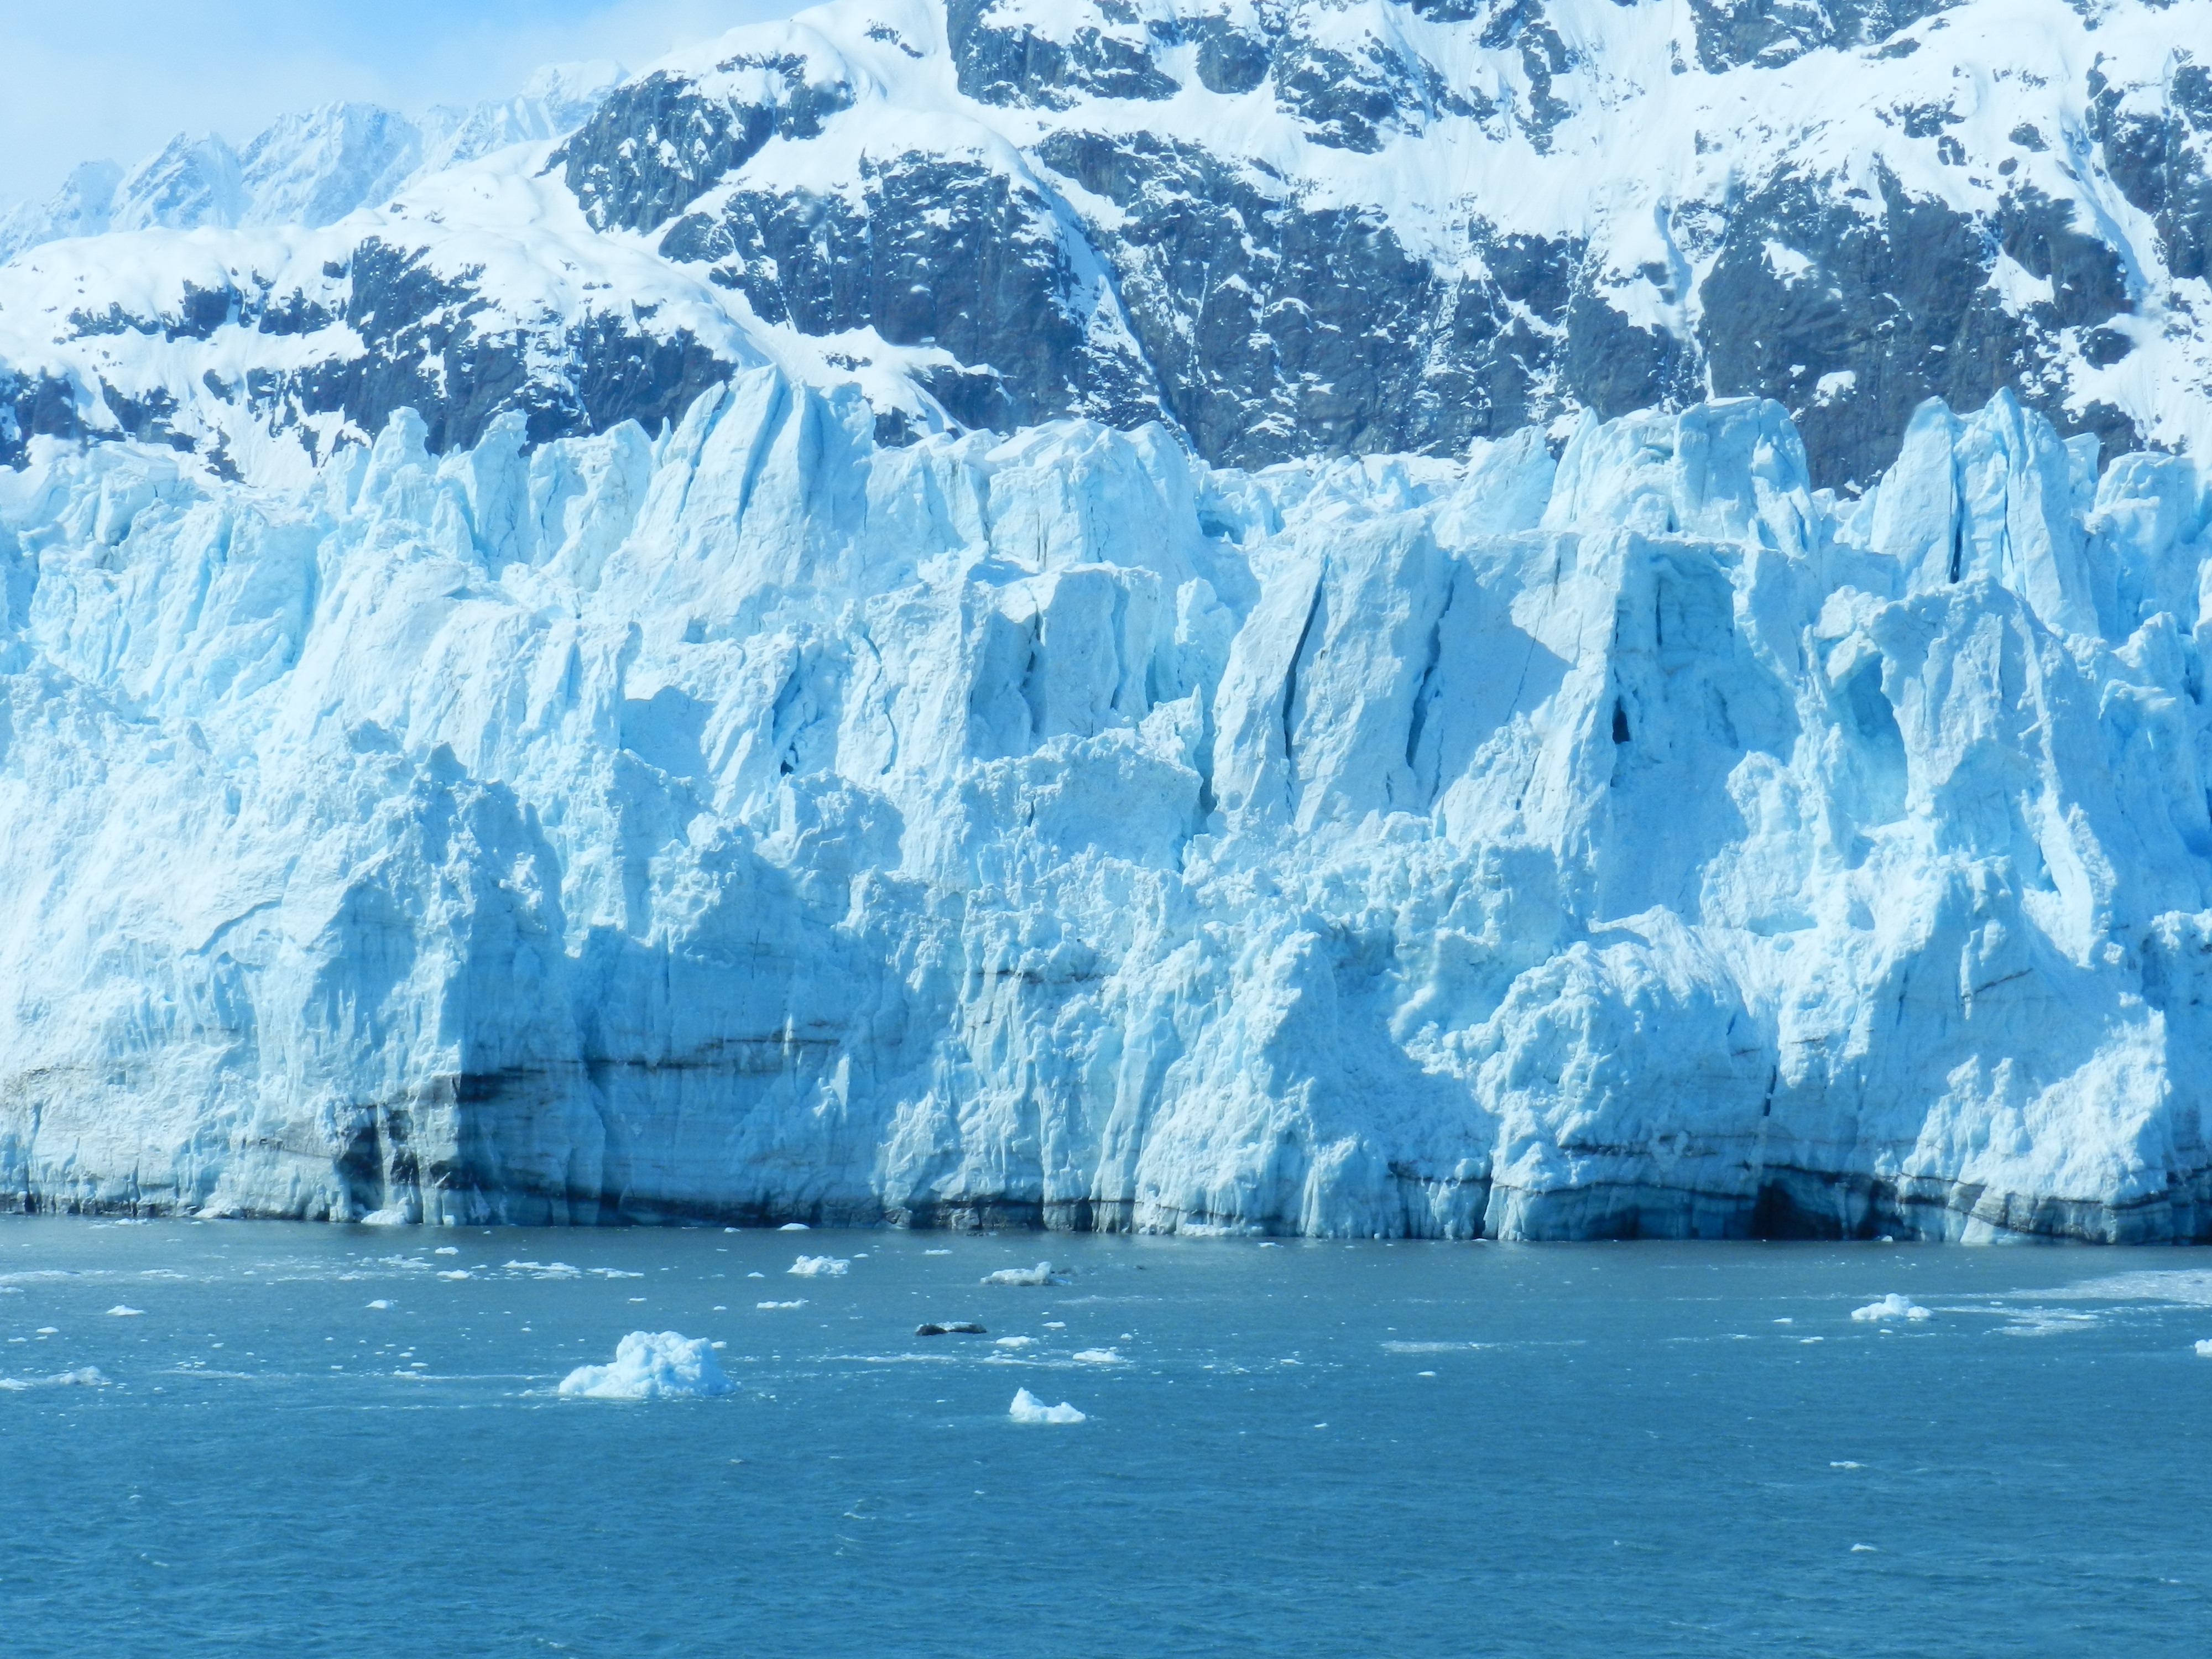 Amazing Glacier Pictures & Backgrounds